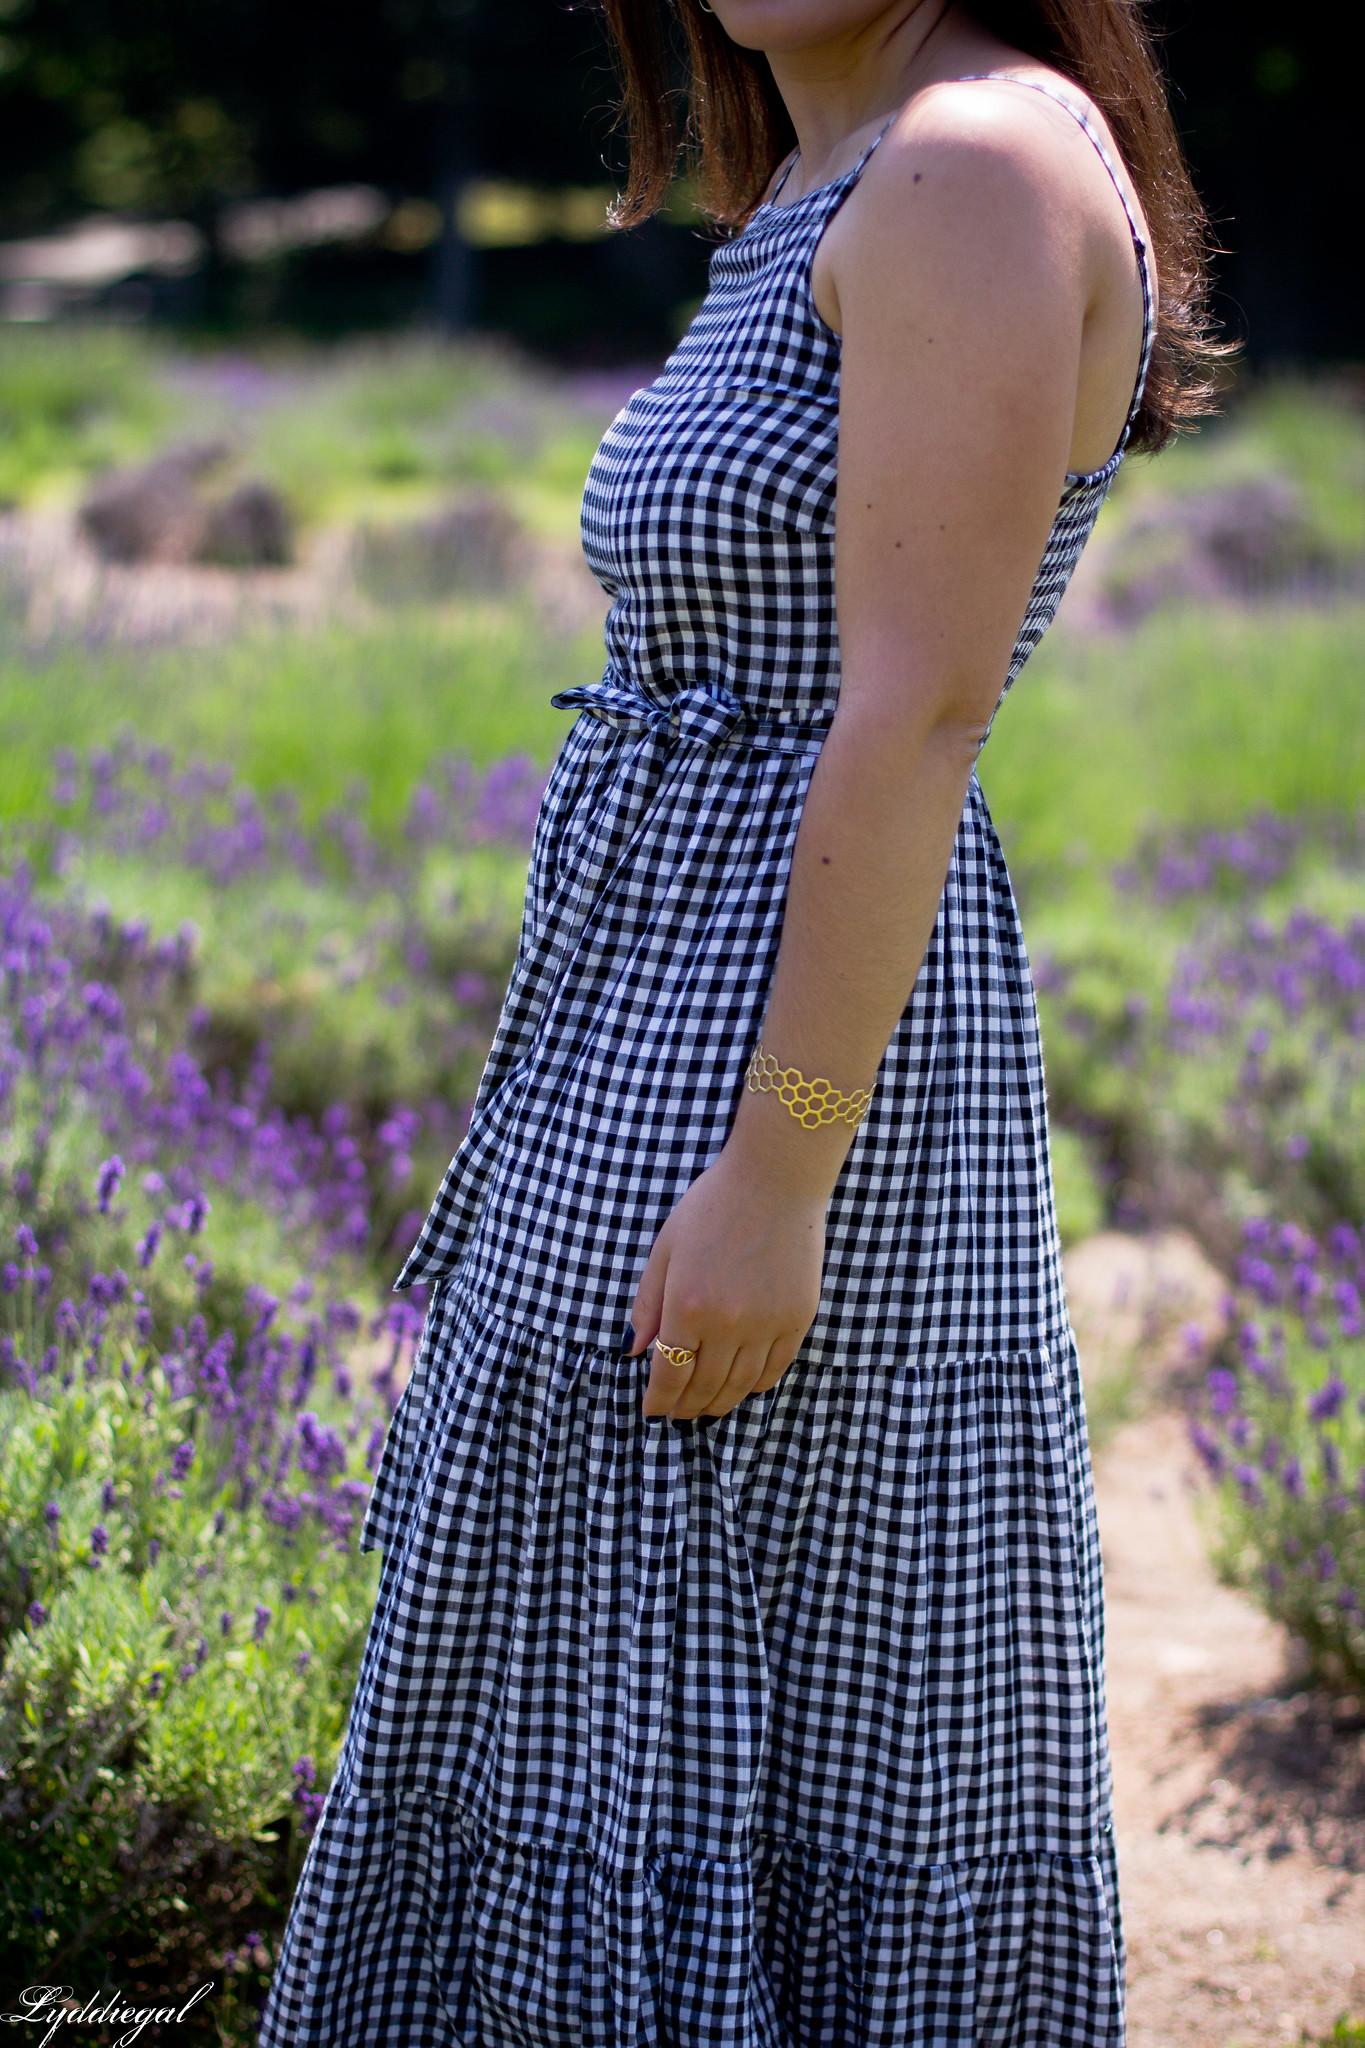 gingham maxi dress, pinata tote bag, lavender field-13.jpg